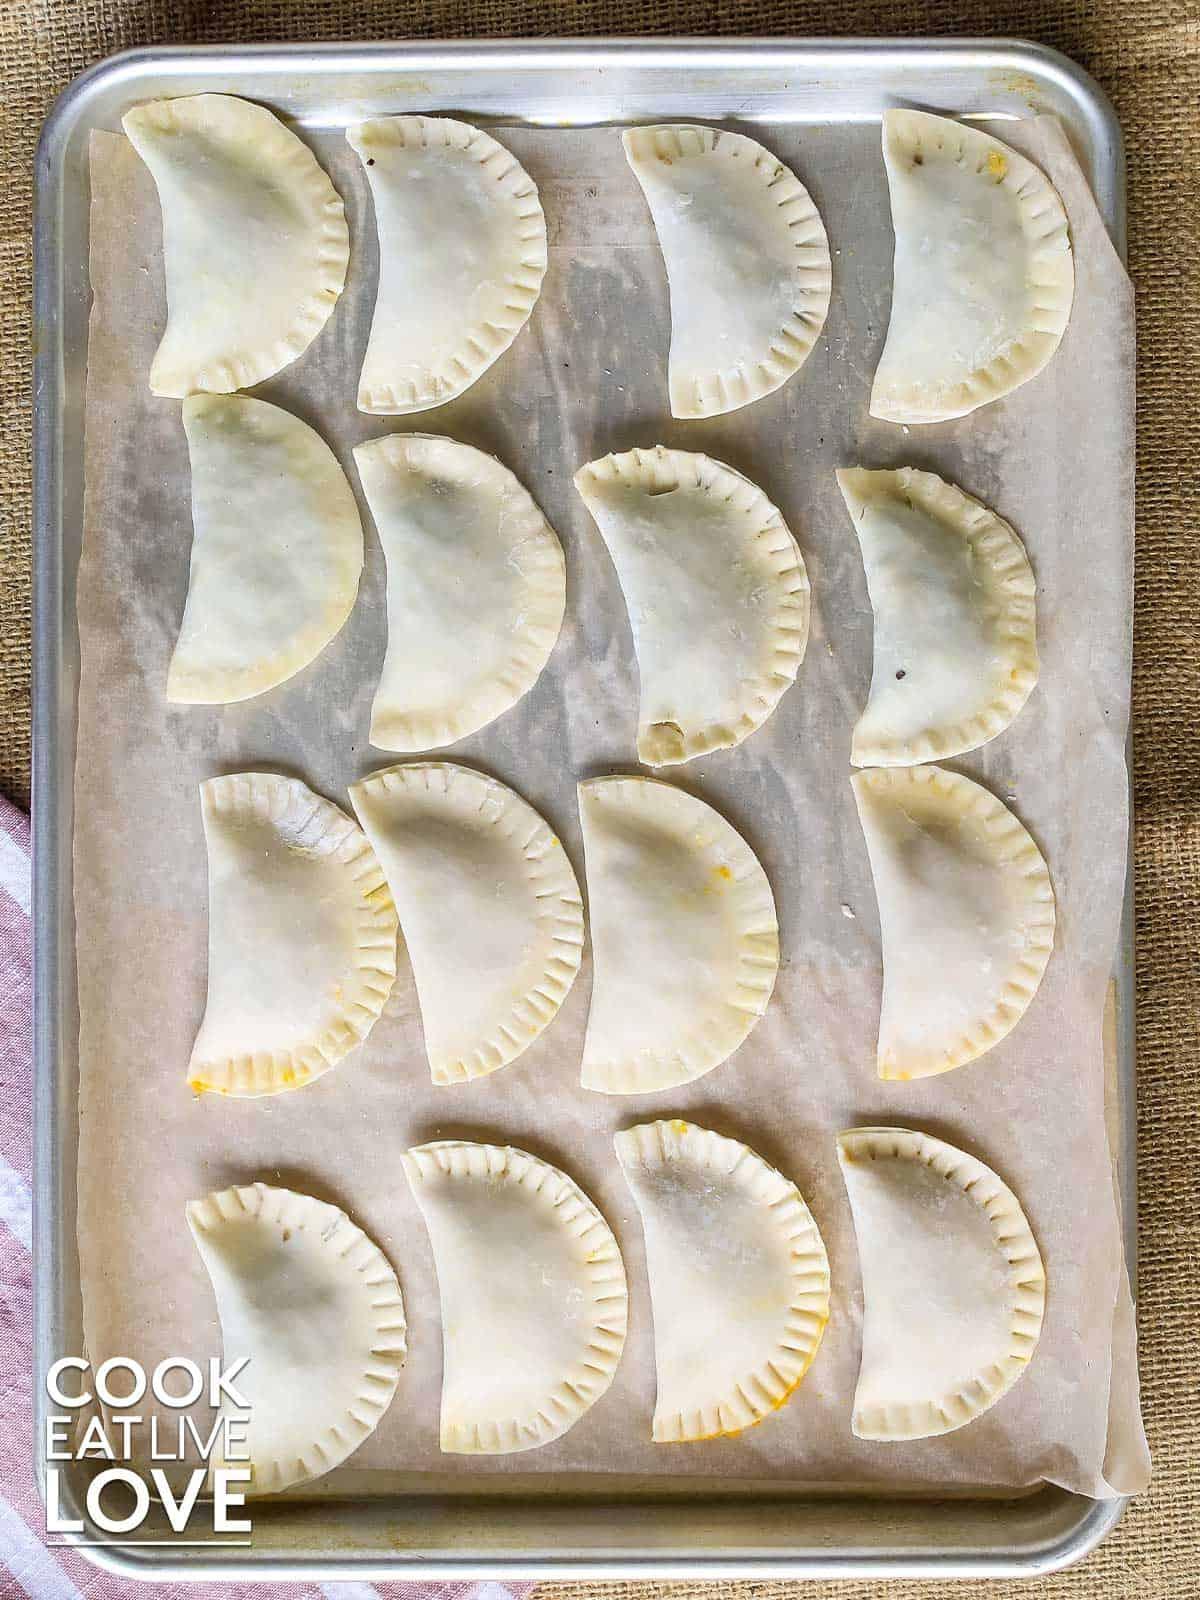 Wonton raviolis are laid out on baking sheet tray to freeze.